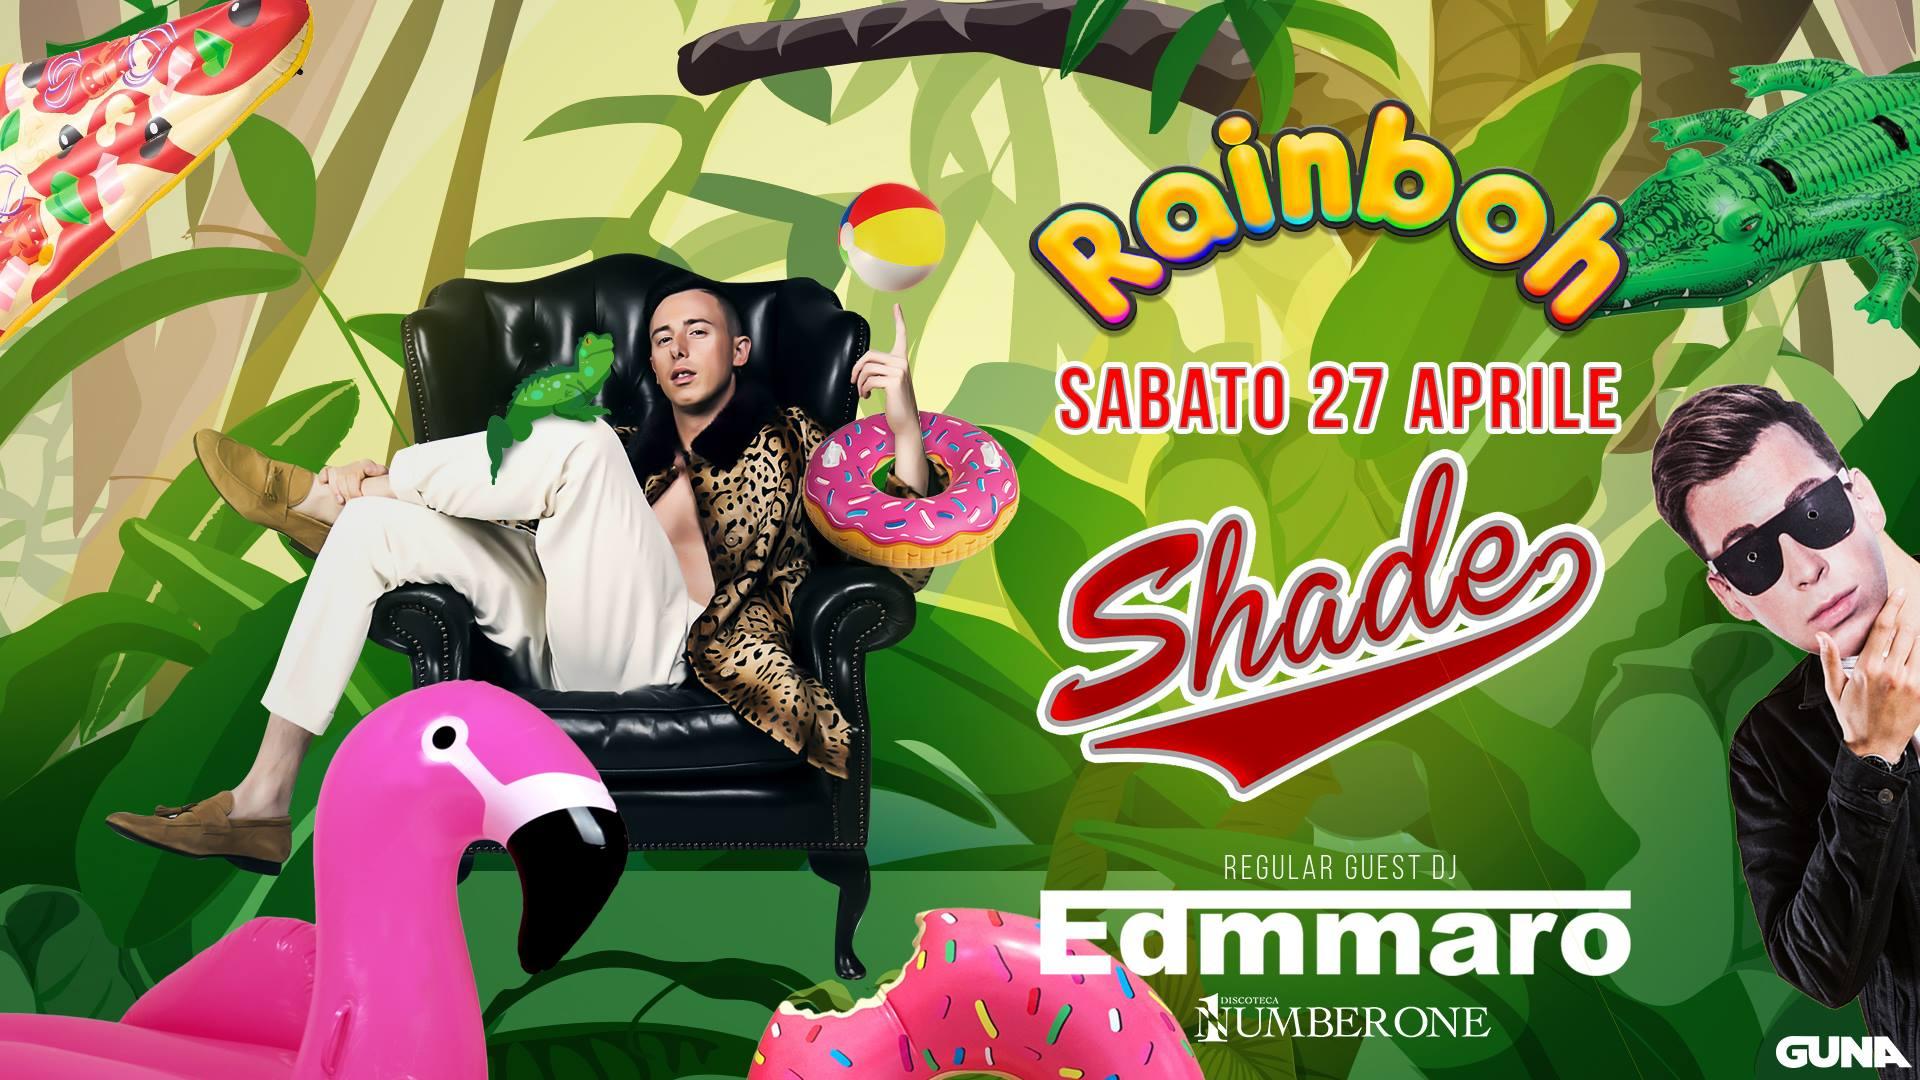 Rainboh with Shade & Edmmaro